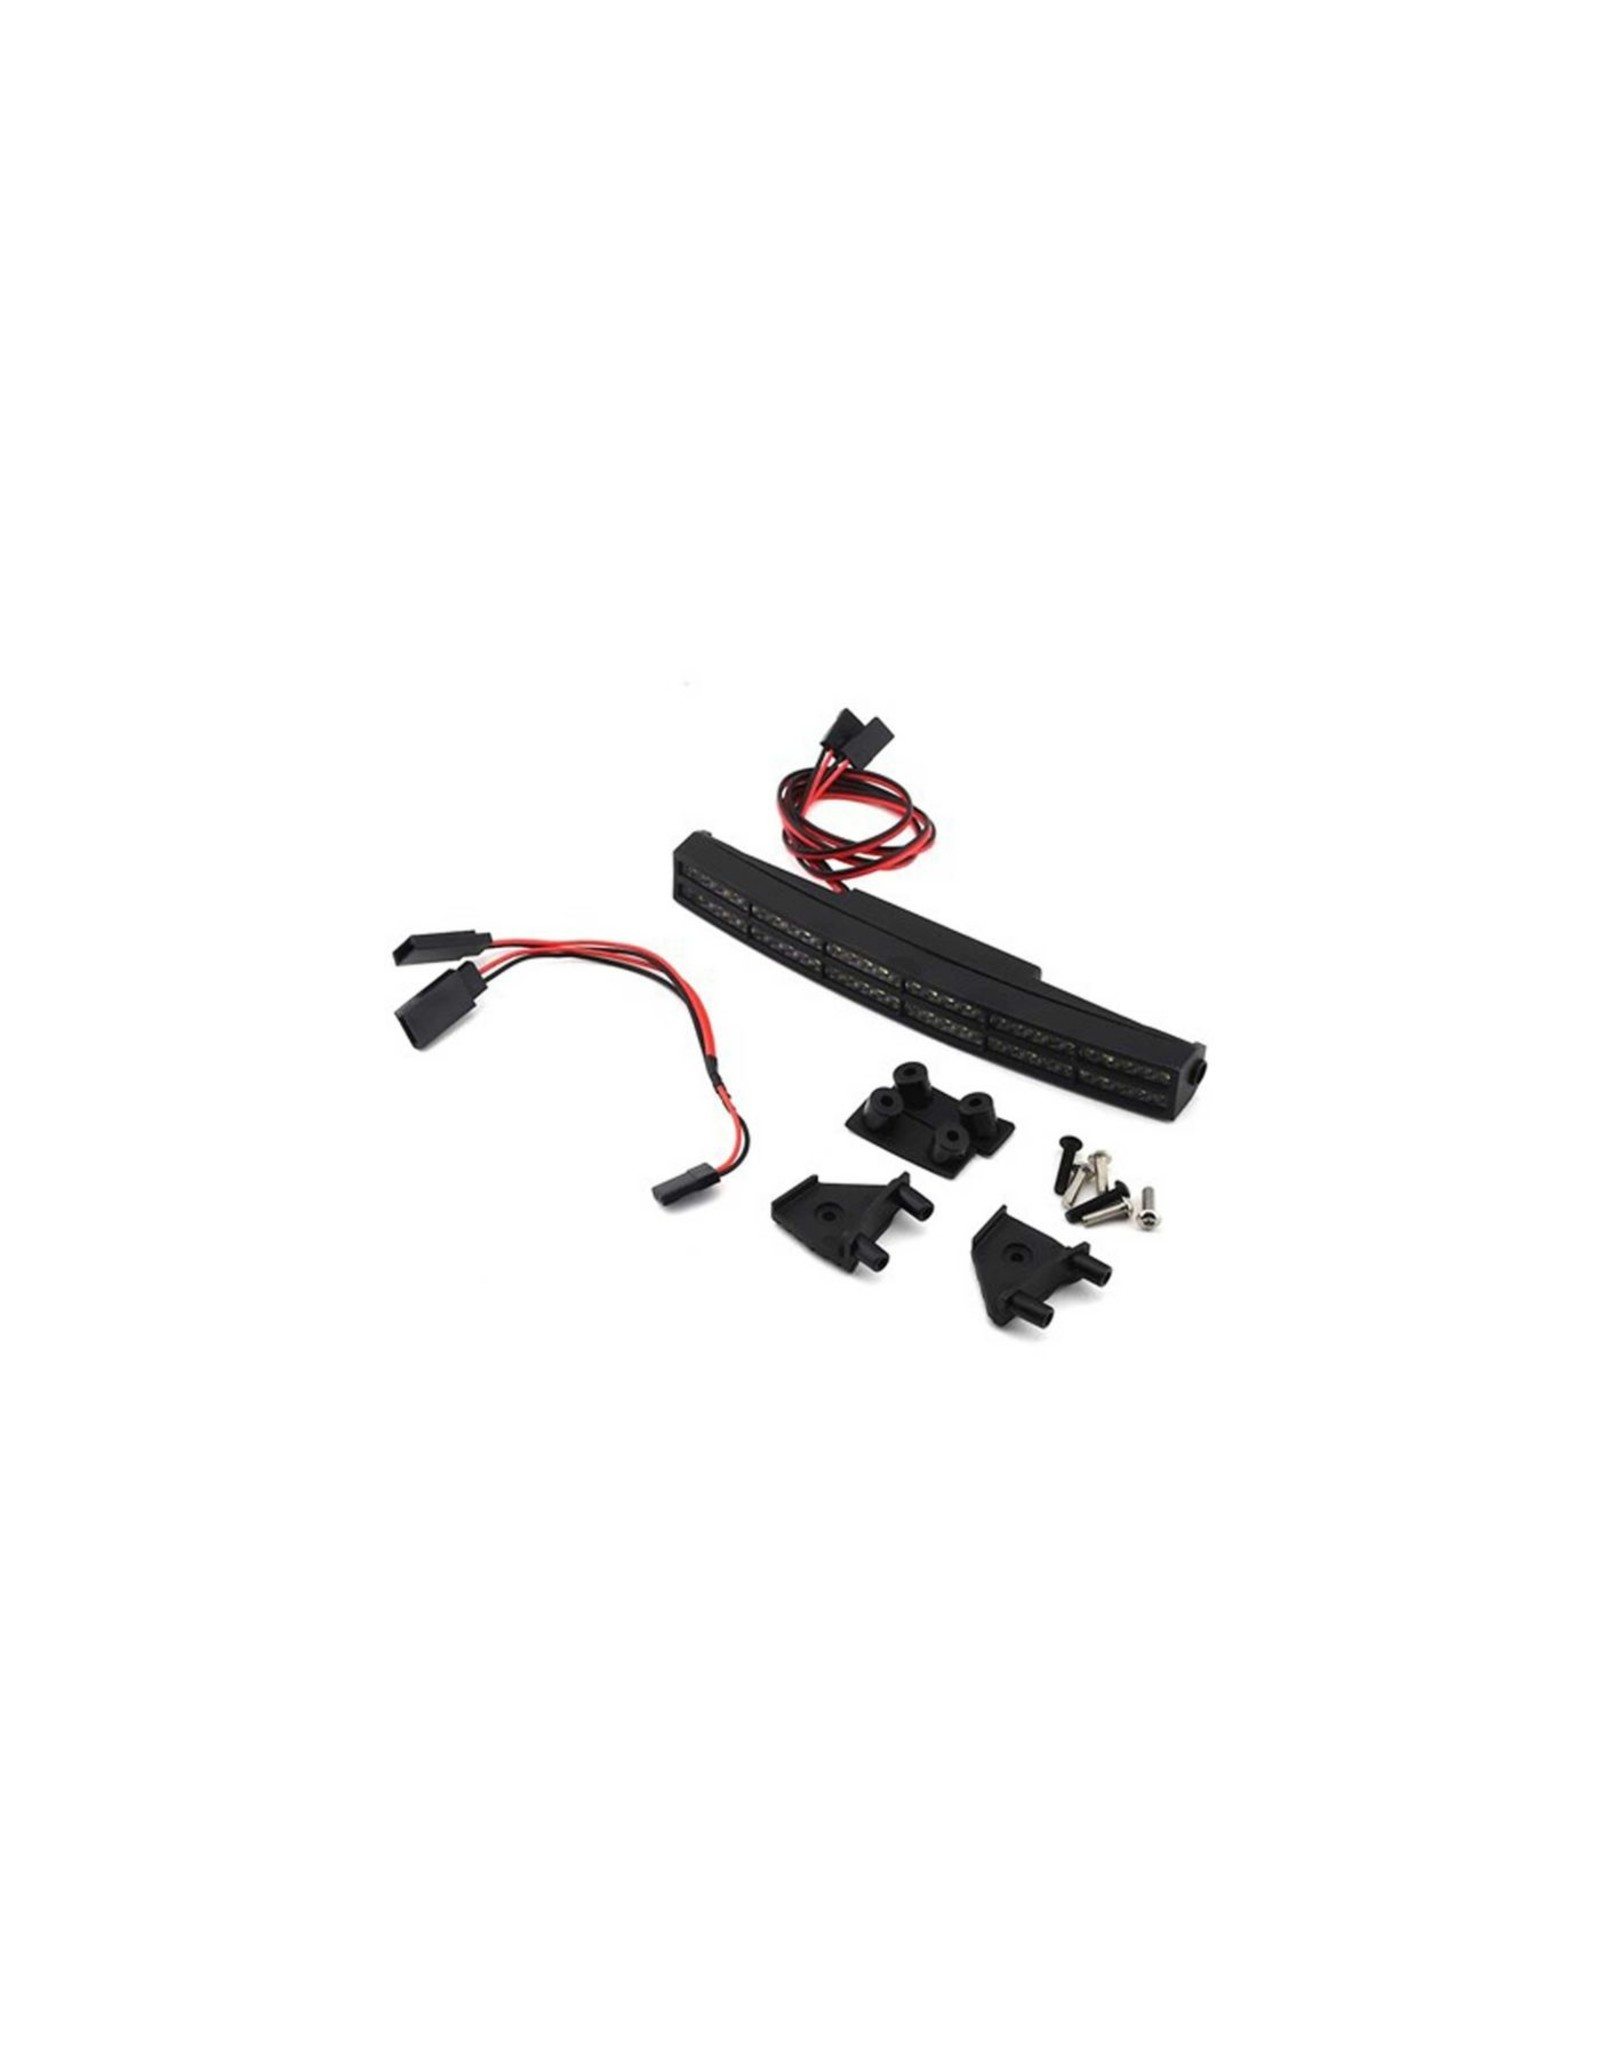 "Pro-Line Racing Double Row 6"" Super-Bright LED Light Bar X-MAXX (PRO627605)"